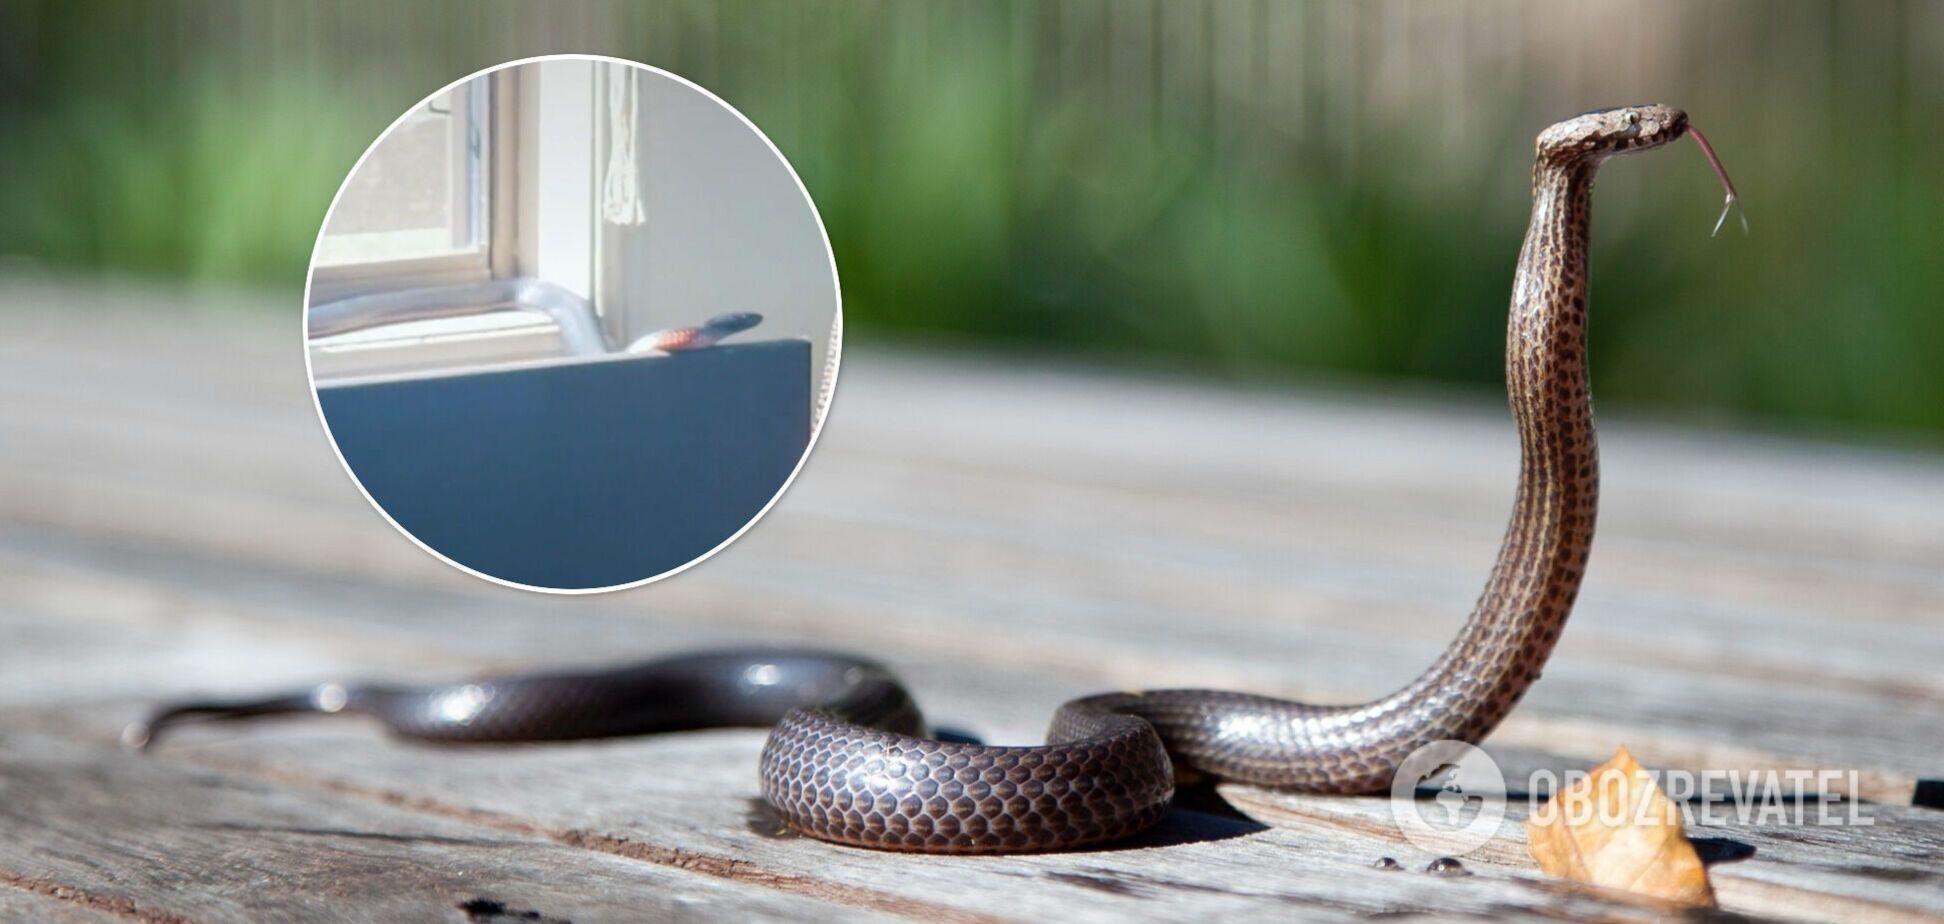 Блогерка знайшла в себе вдома змію